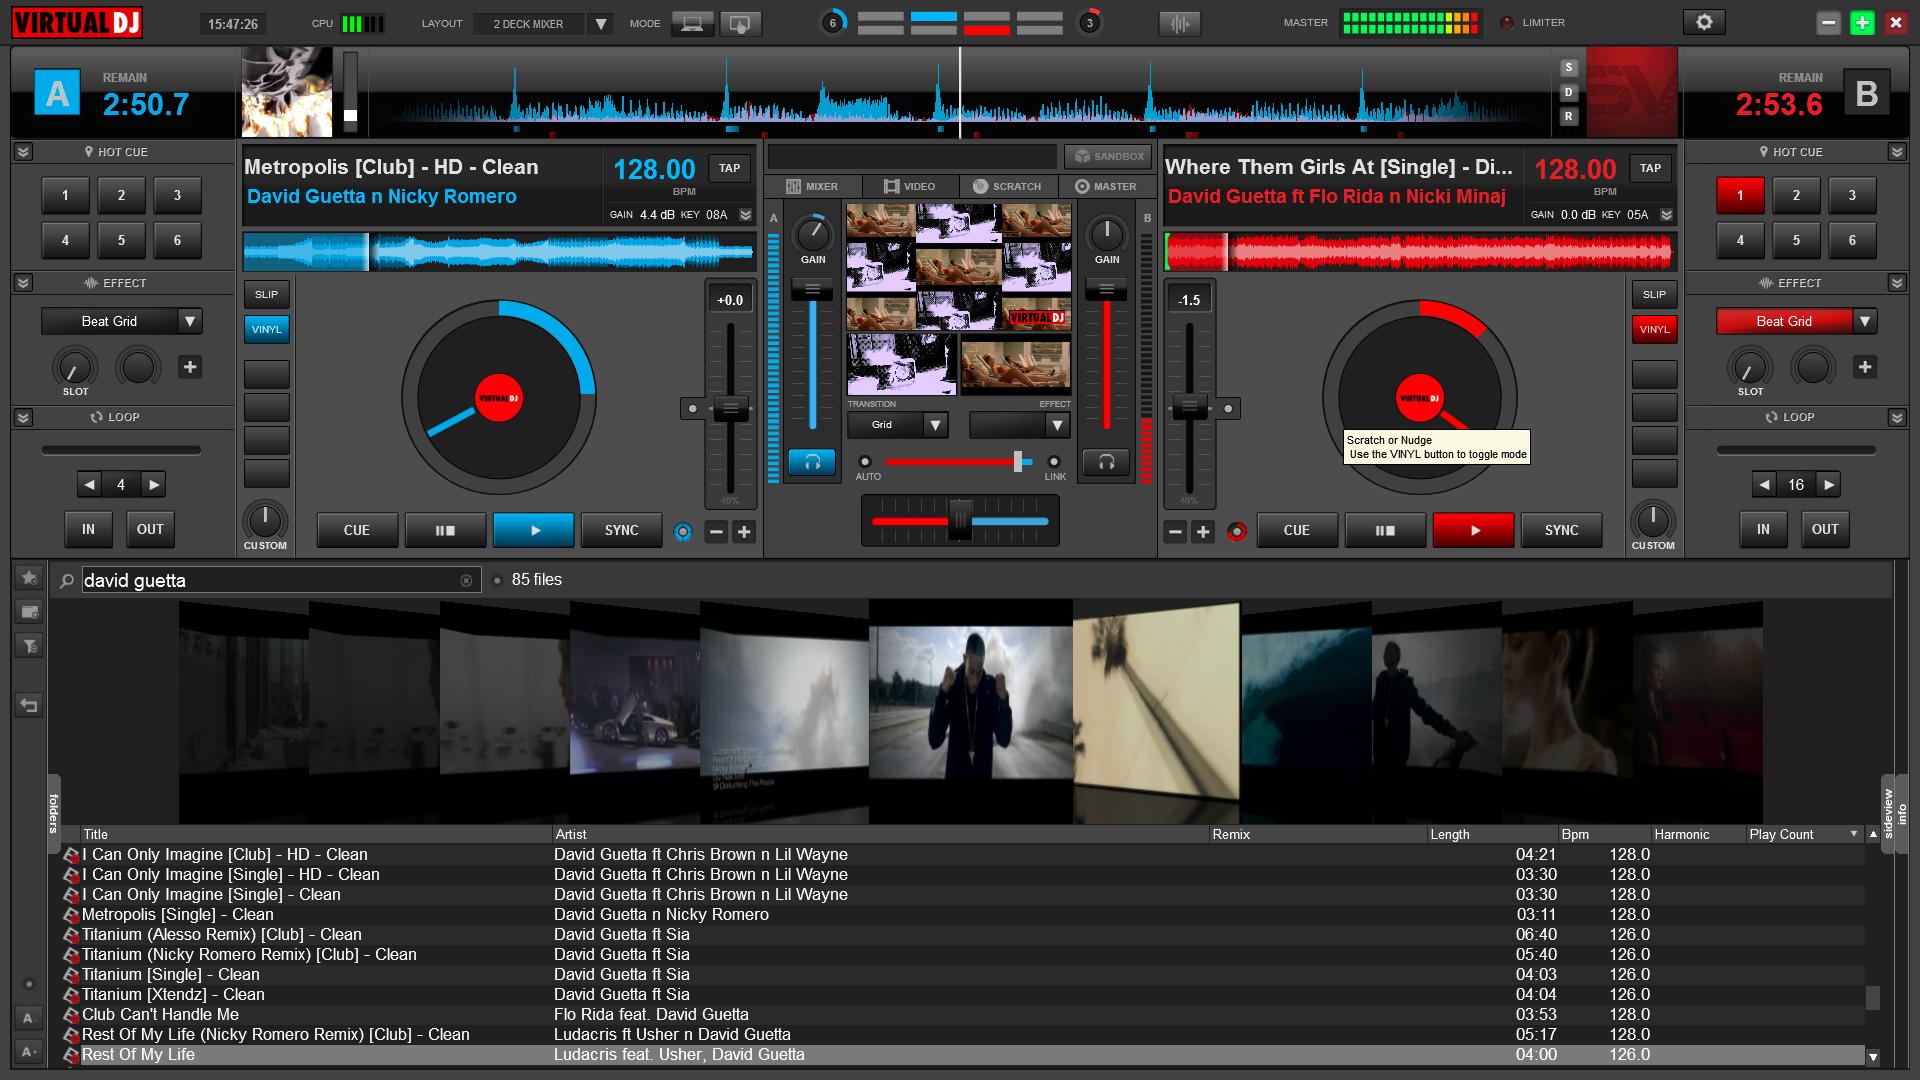 PROGRAMA VIRTUAL FREE BAIXAR DJ 7.0.5 HOME